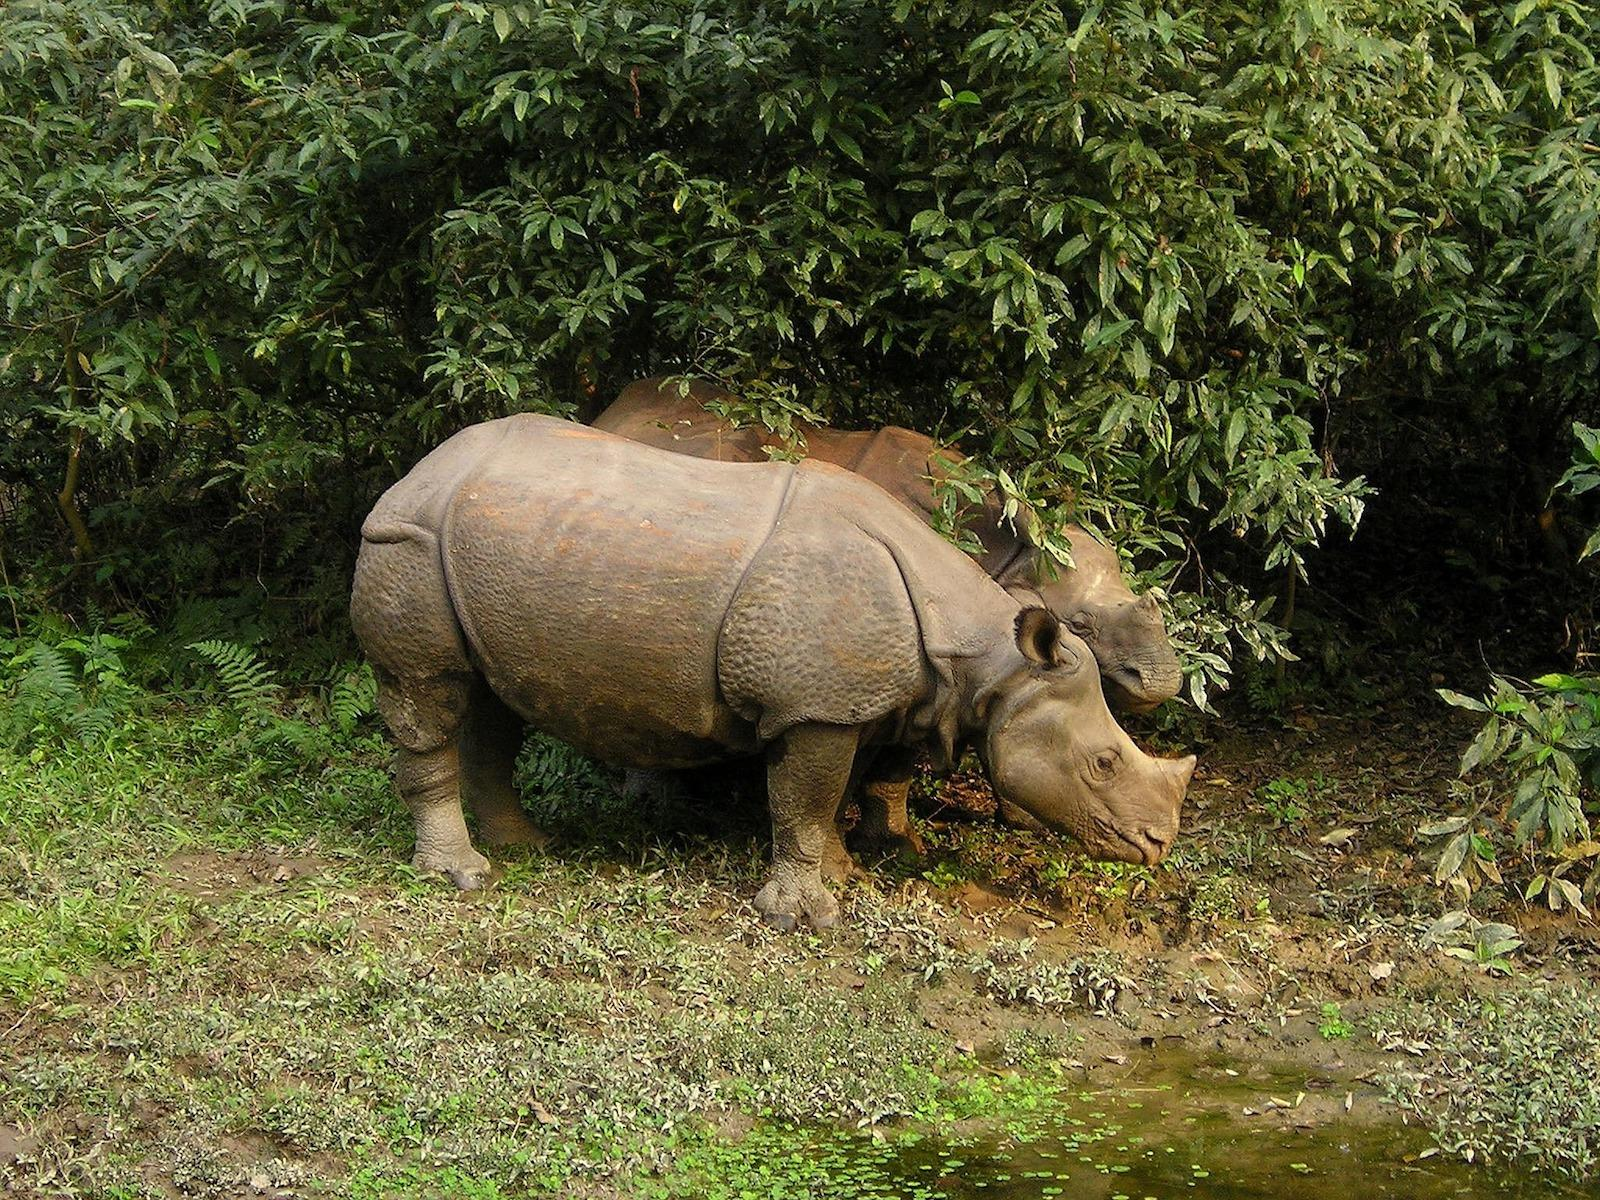 rhino-382_1920-1497929152171.jpg